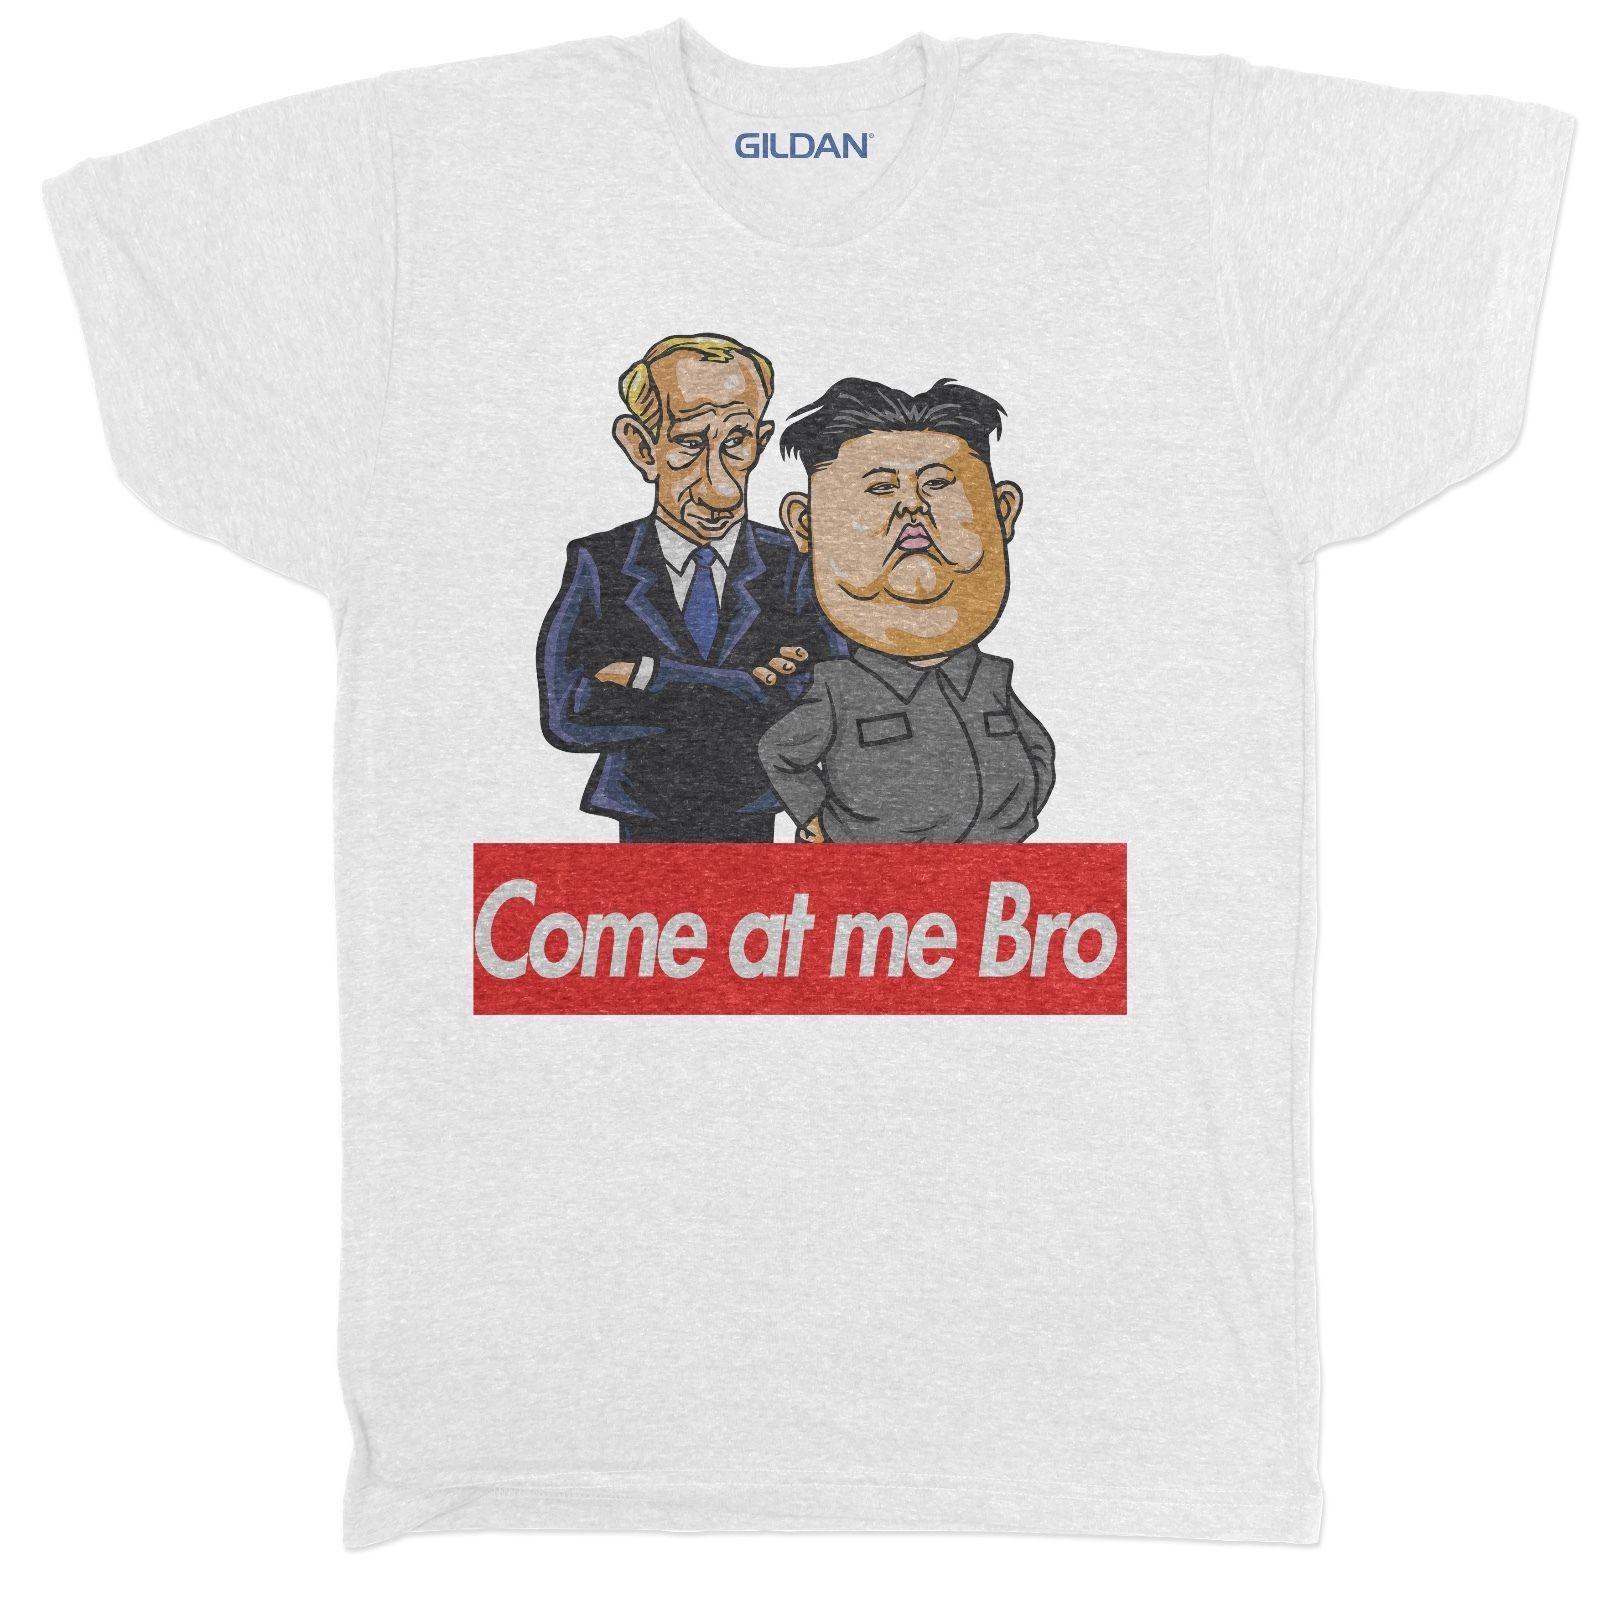 cd586ae64 VLADIMIR PUTIN KIM JONG UN COME AT ME PRESIDENT TRUMP MOVIE FILM Cotton Men T  Shirts Classical Comfortable Fabric Crazy T Shirts Designs Ridiculous T  Shirt ...